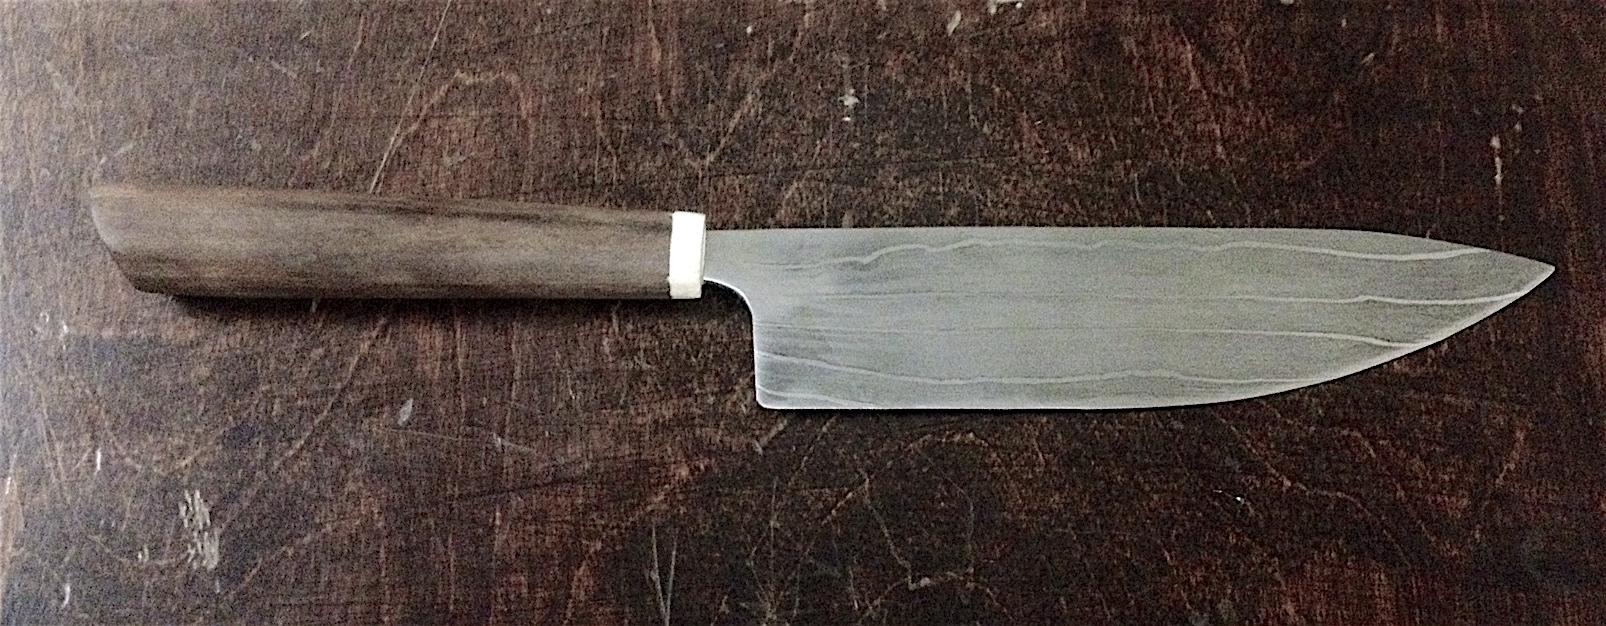 chefs knife web.jpeg